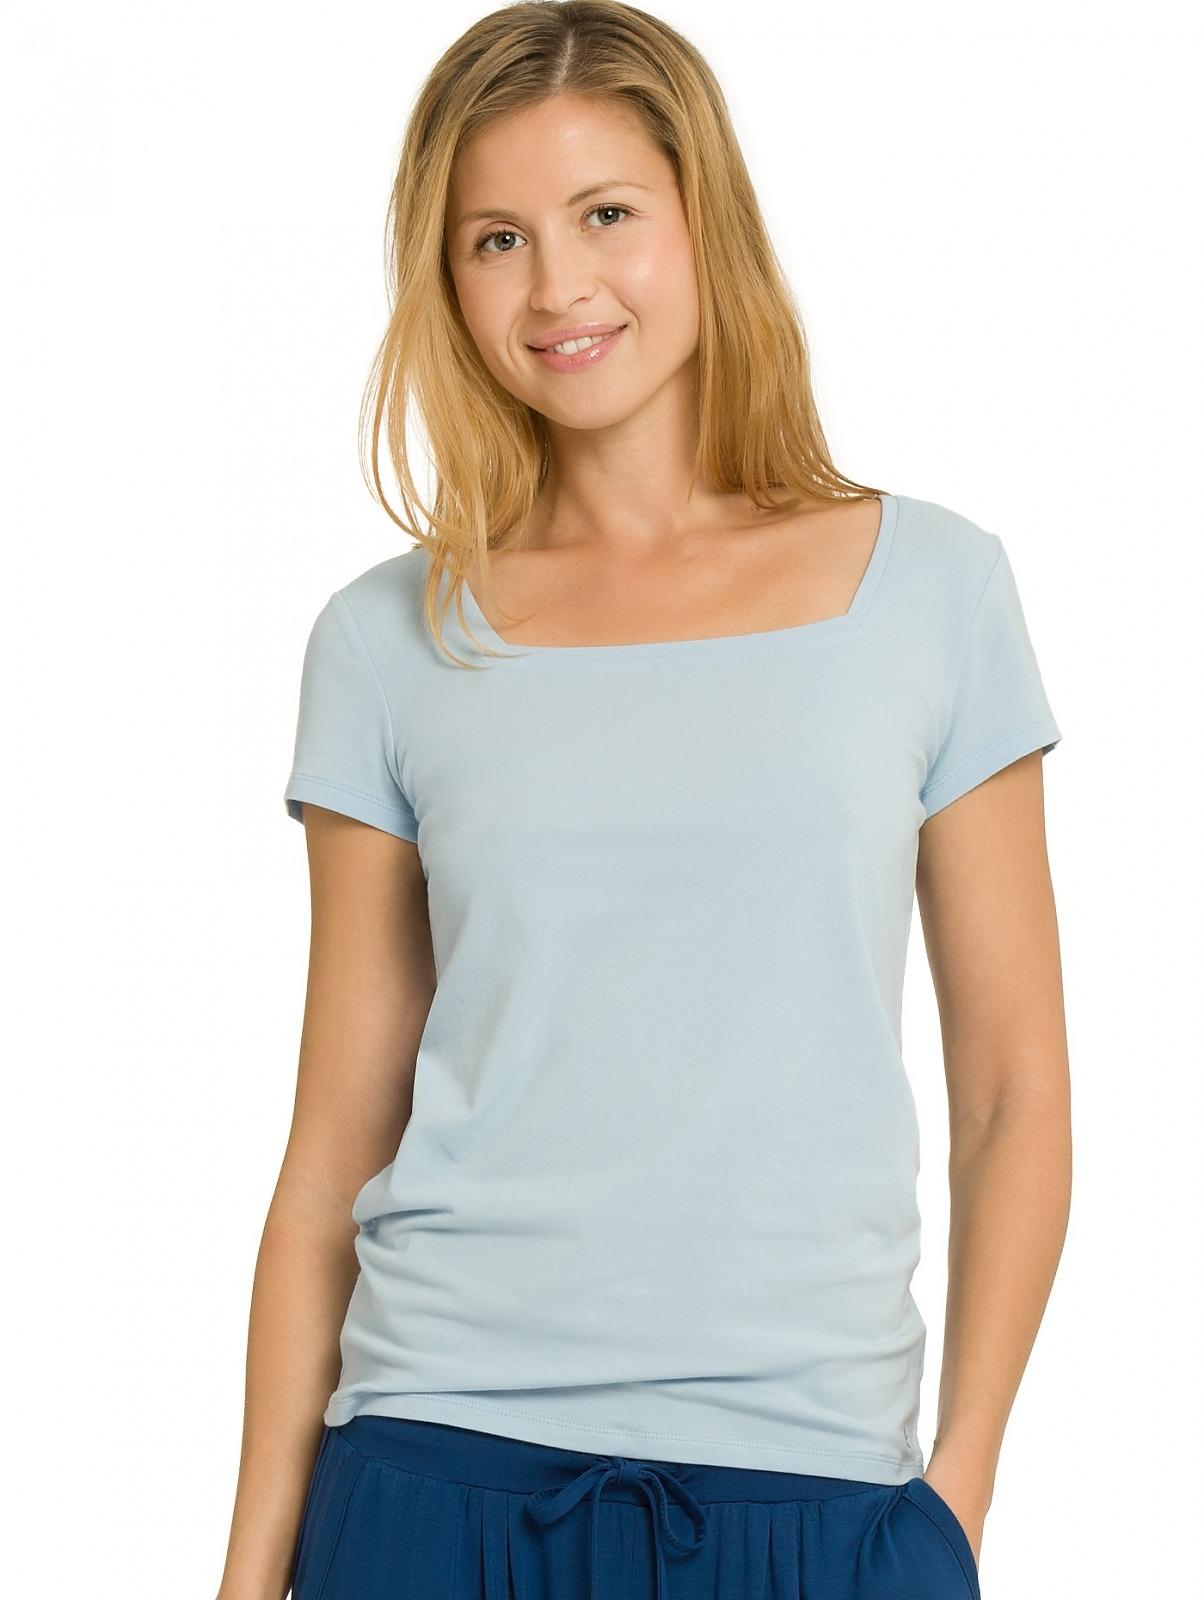 Dámské tričko QS1687E - Calvin Klein - Sv.modrá/M